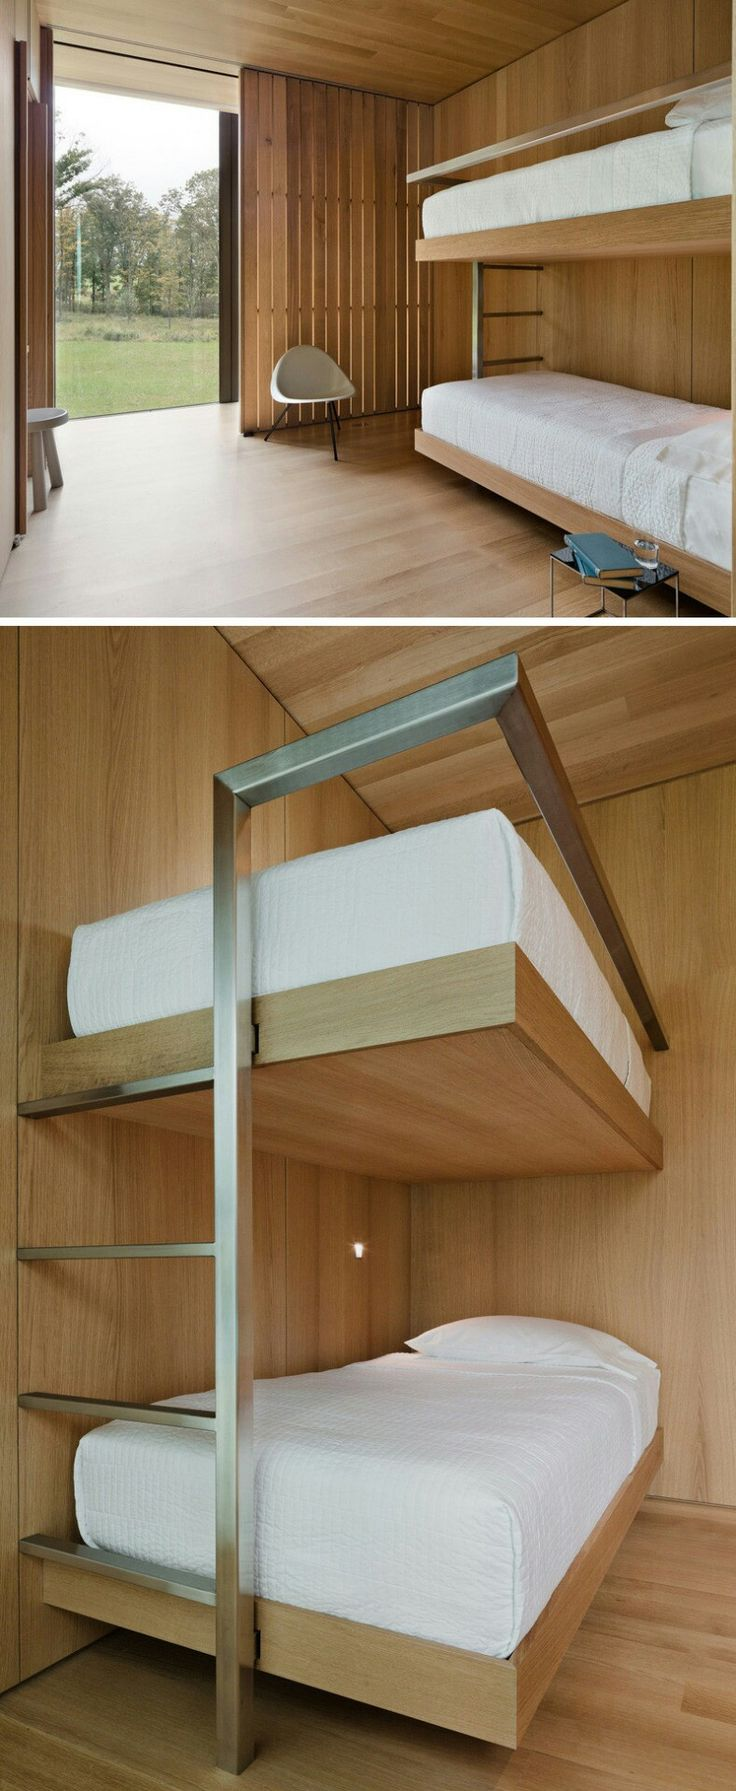 best interior images on pinterest home ideas sleeping loft